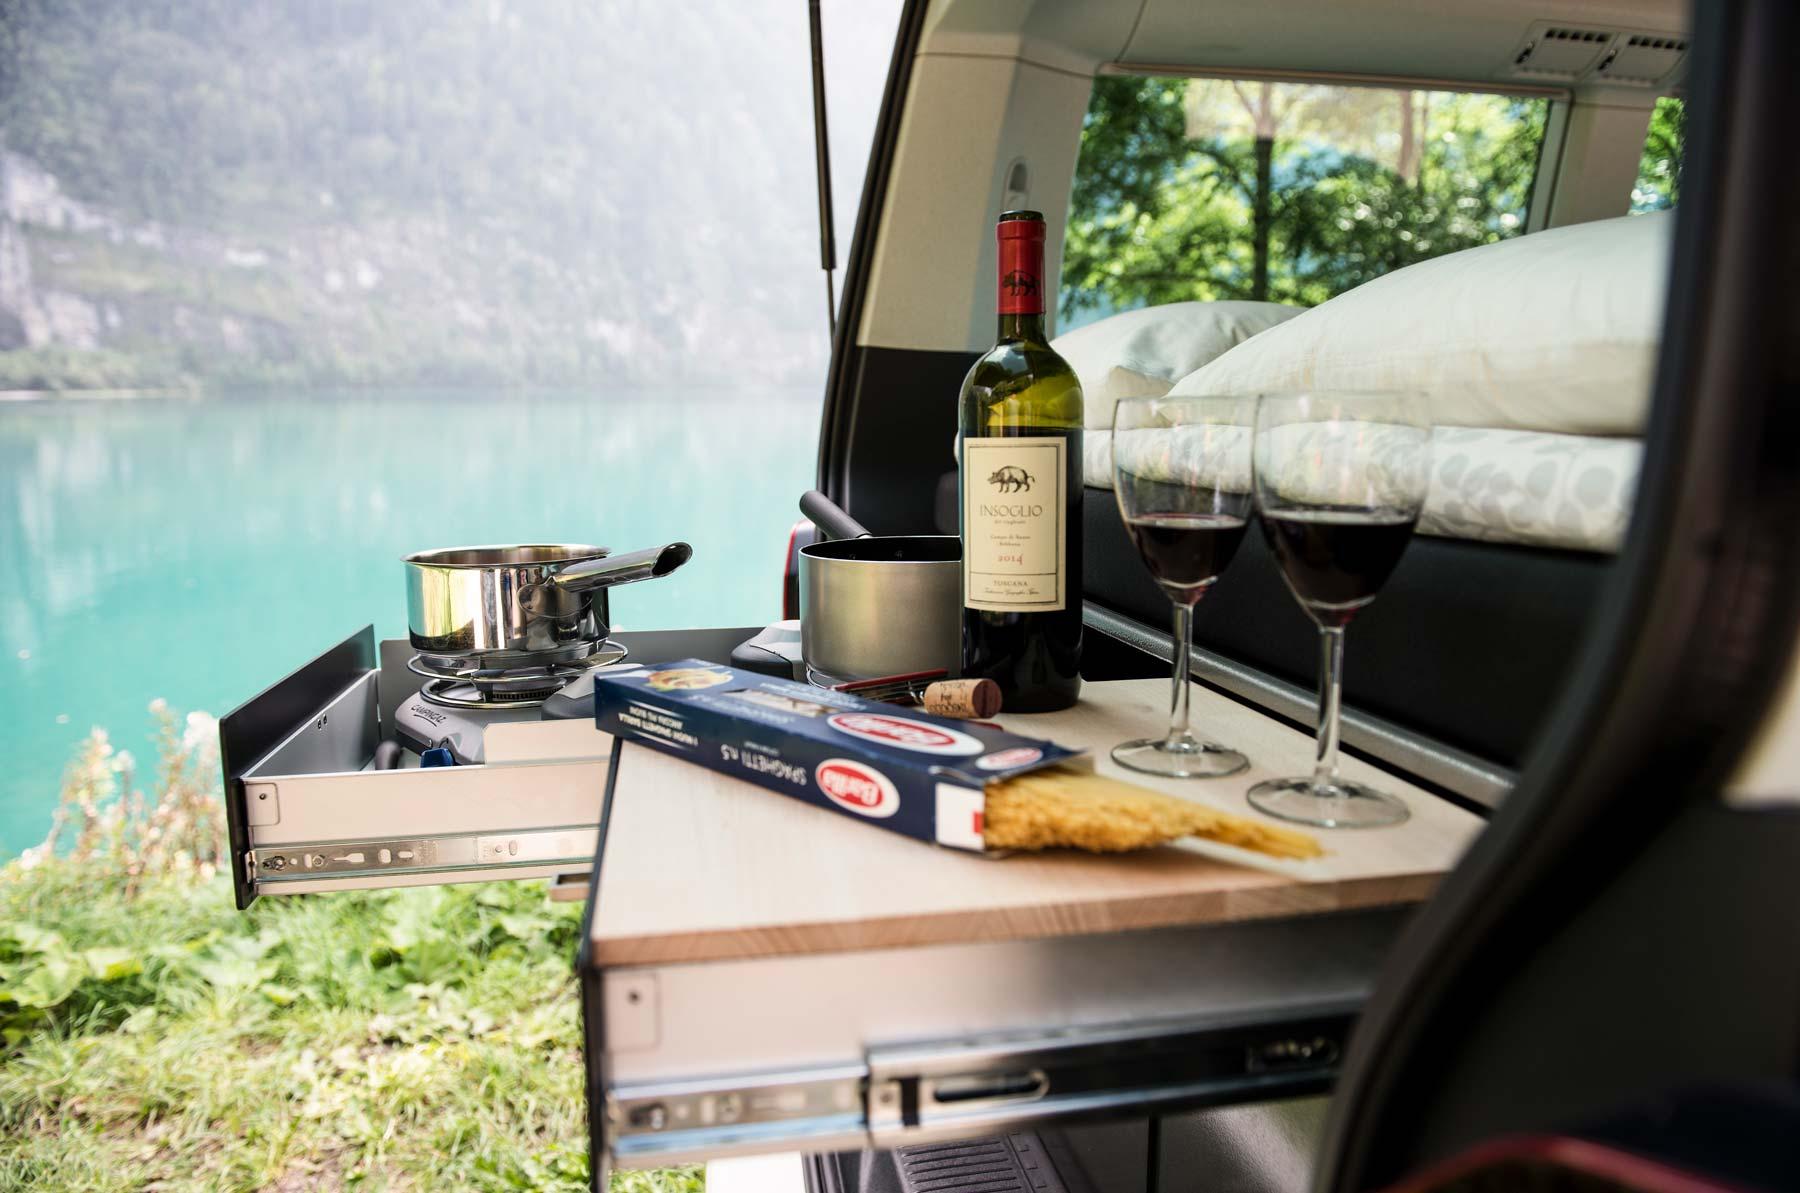 Camper mieten Schweiz, VW Bus, Kuechenzeile, kochen, See, Camping feeling